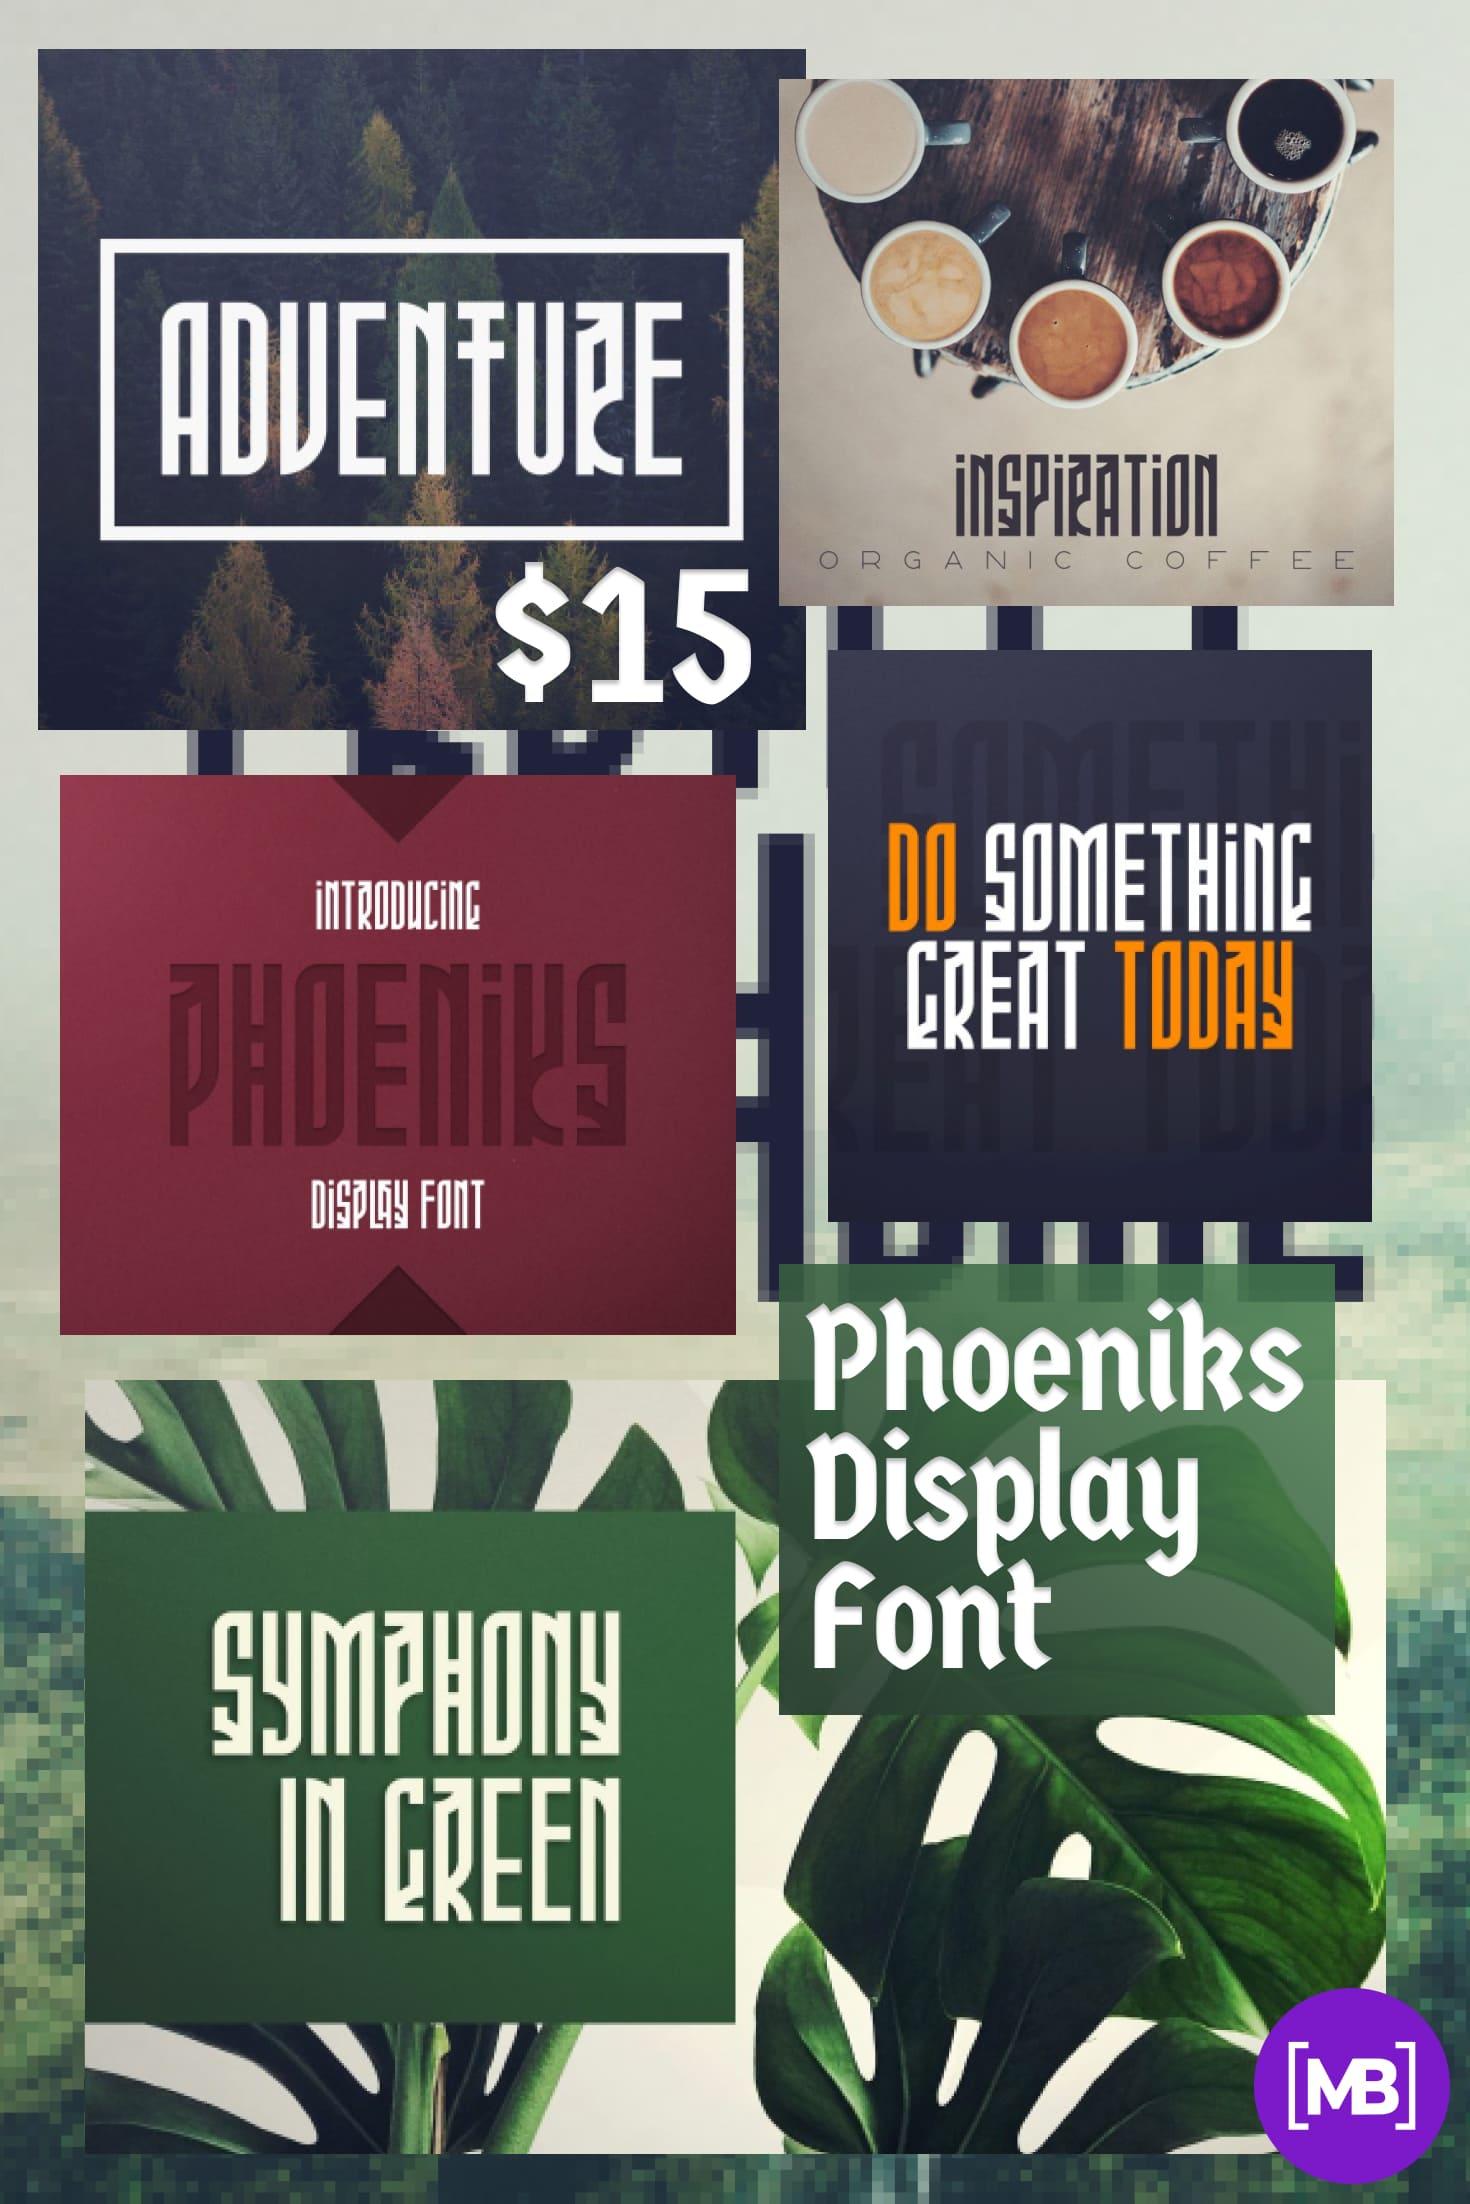 Pinterest Image: Phoeniks Display Font - $15.